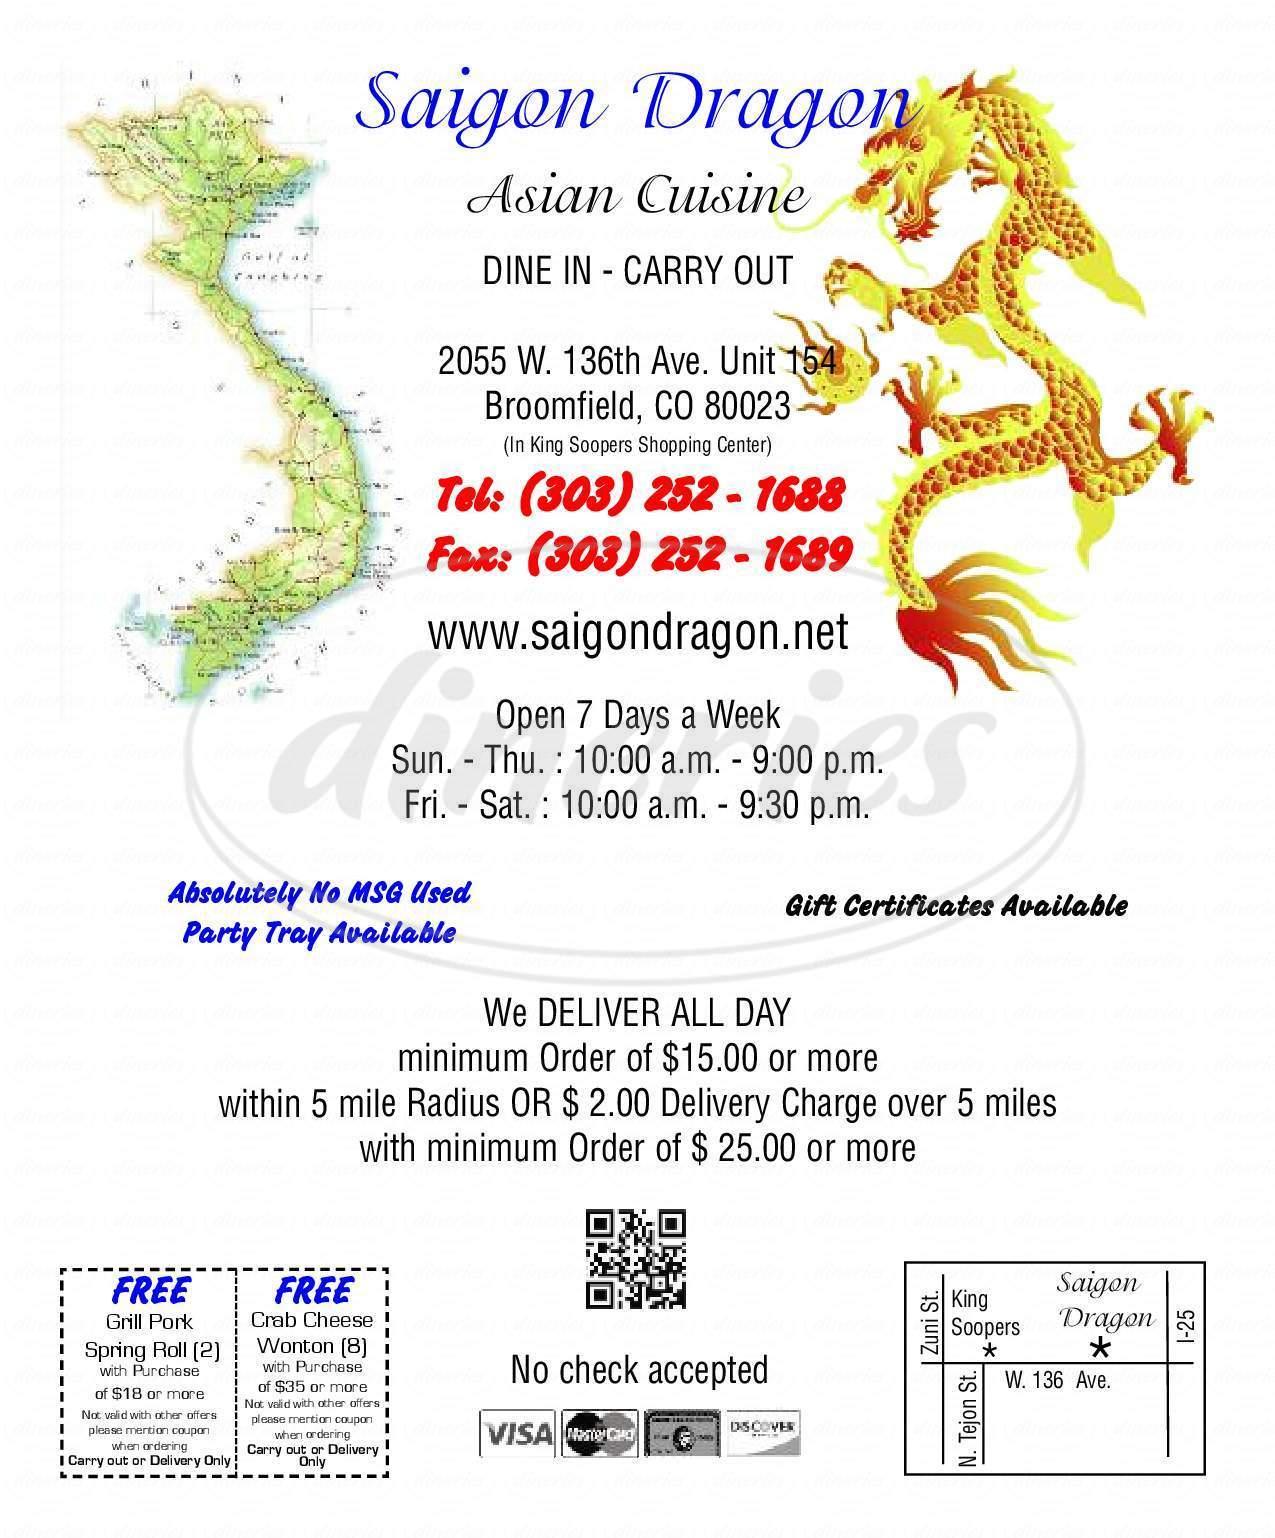 menu for Saigon Dragon Asian Cuisine